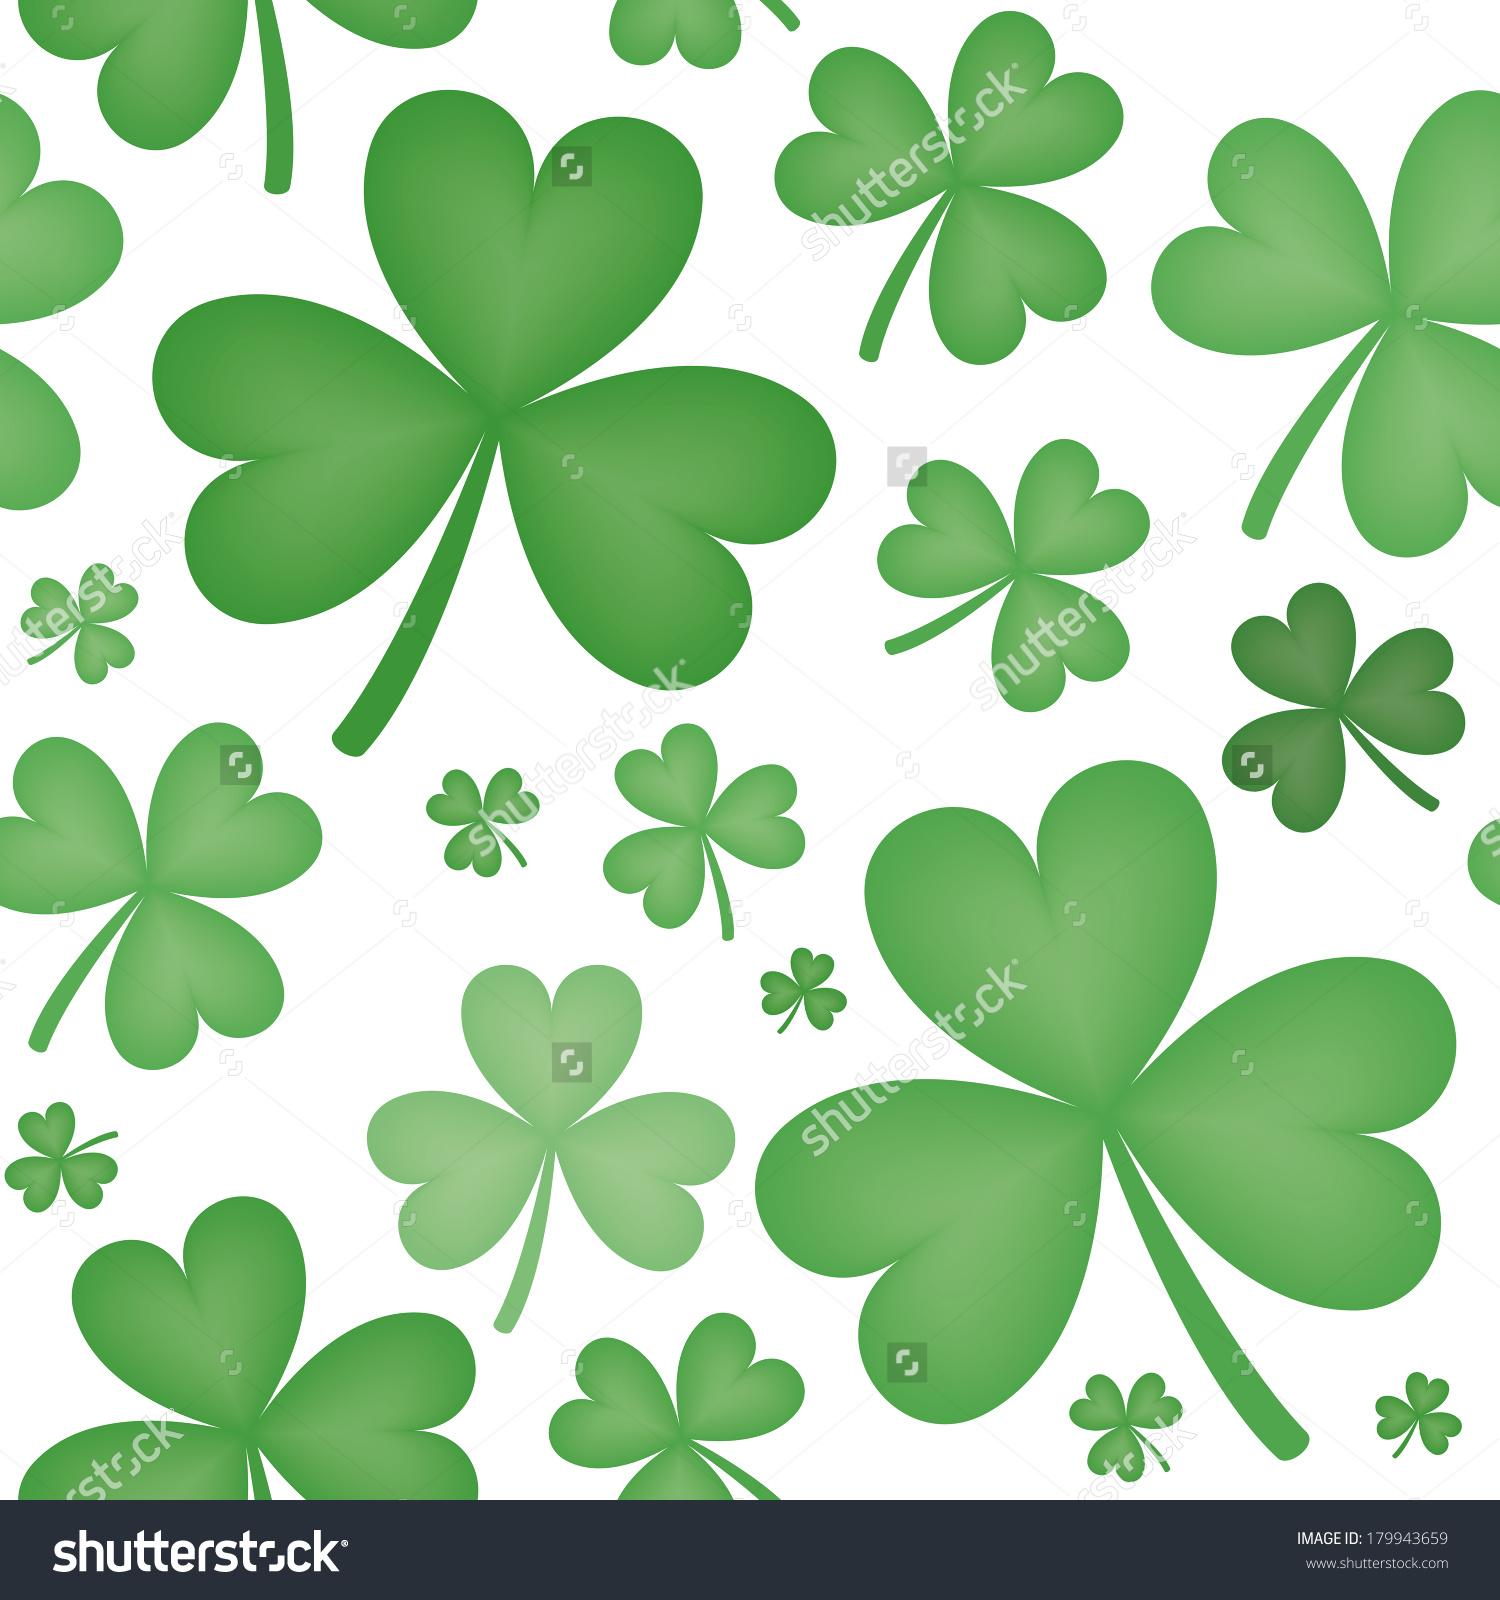 Seamless Pattern Green Shamrock Shapes Varying Stock Illustration.